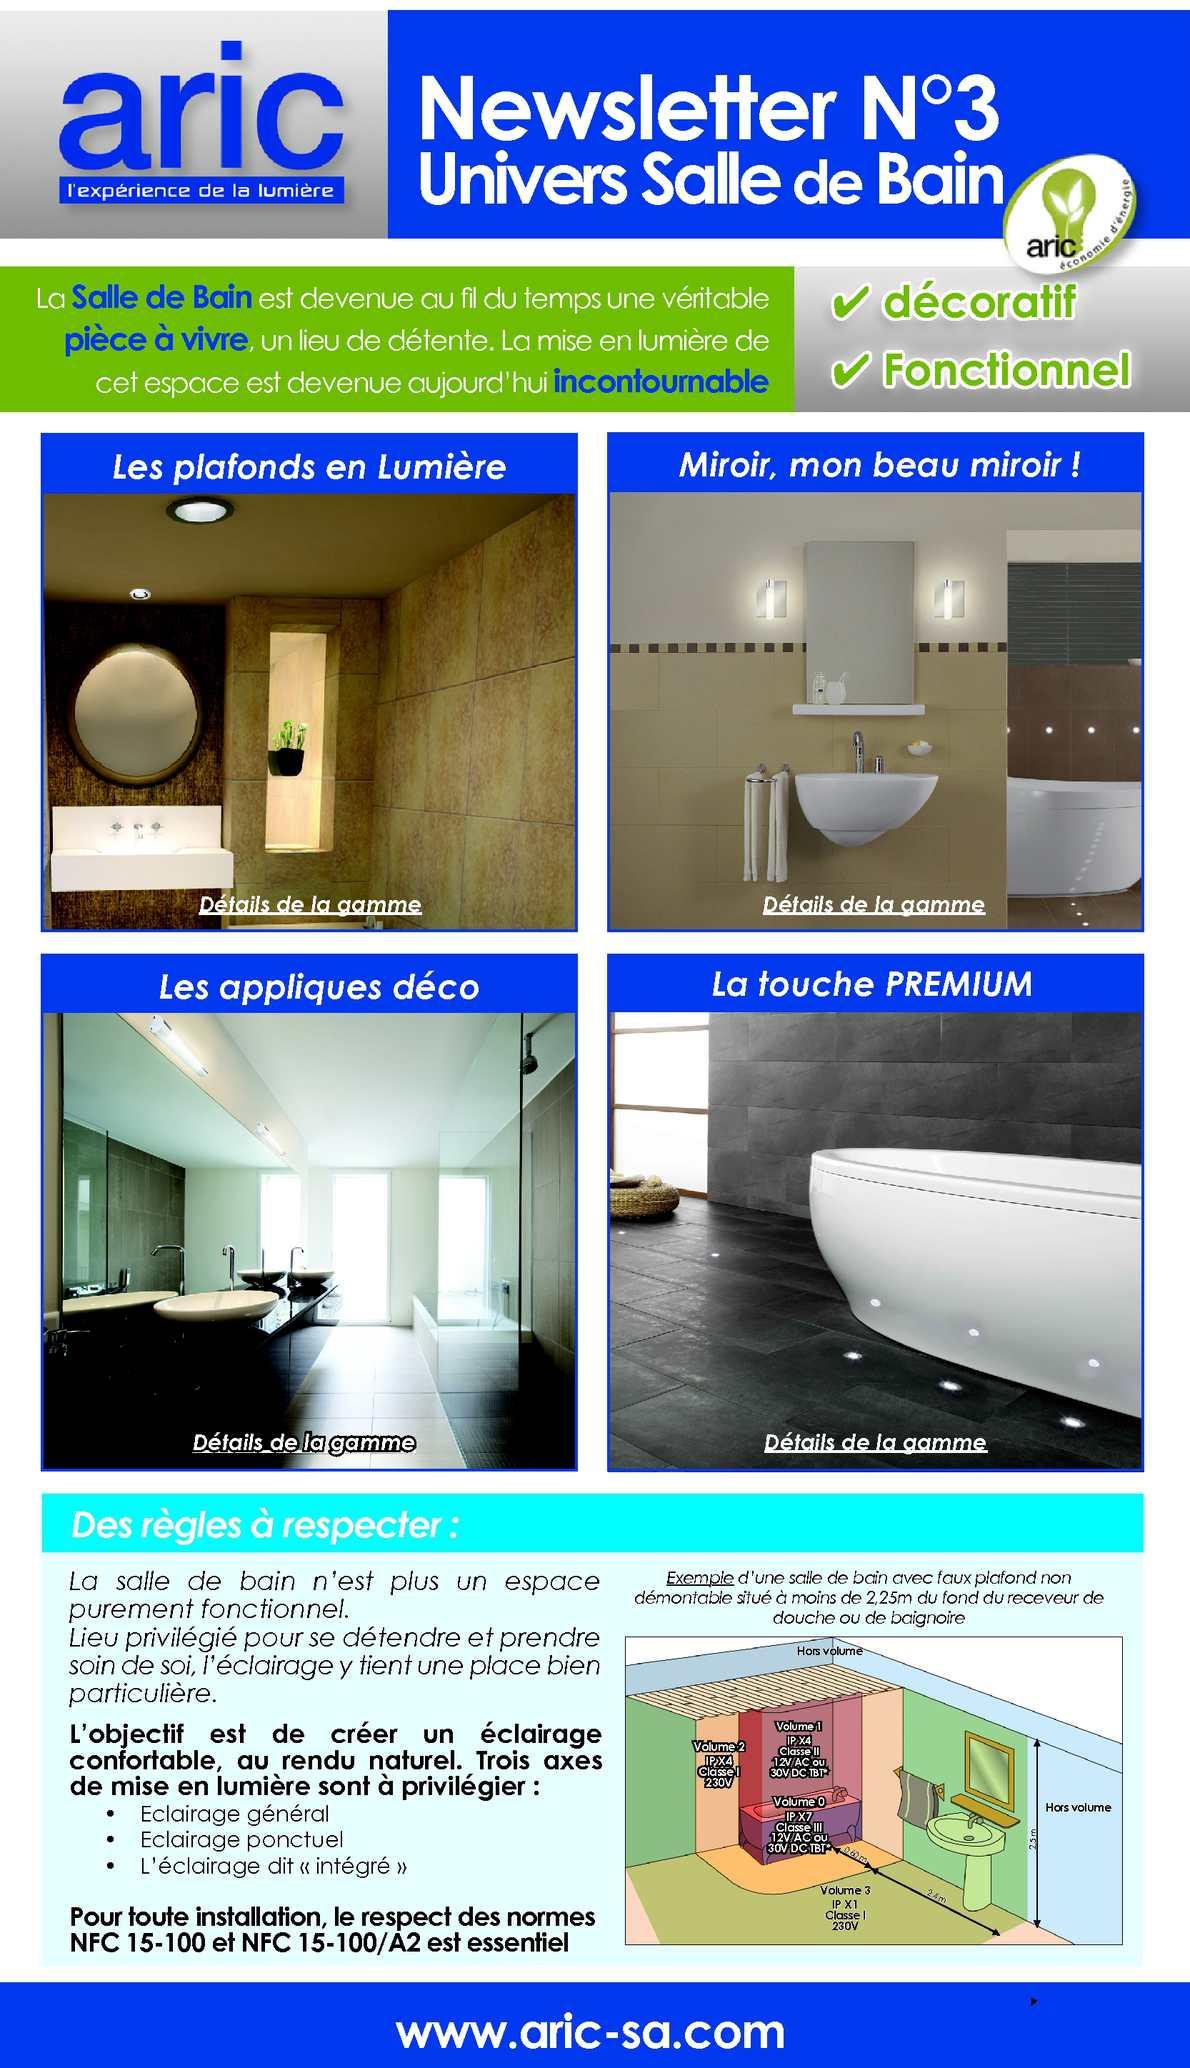 Eclairage Volume 2 Salle De Bain calaméo - aric newsletter n°3